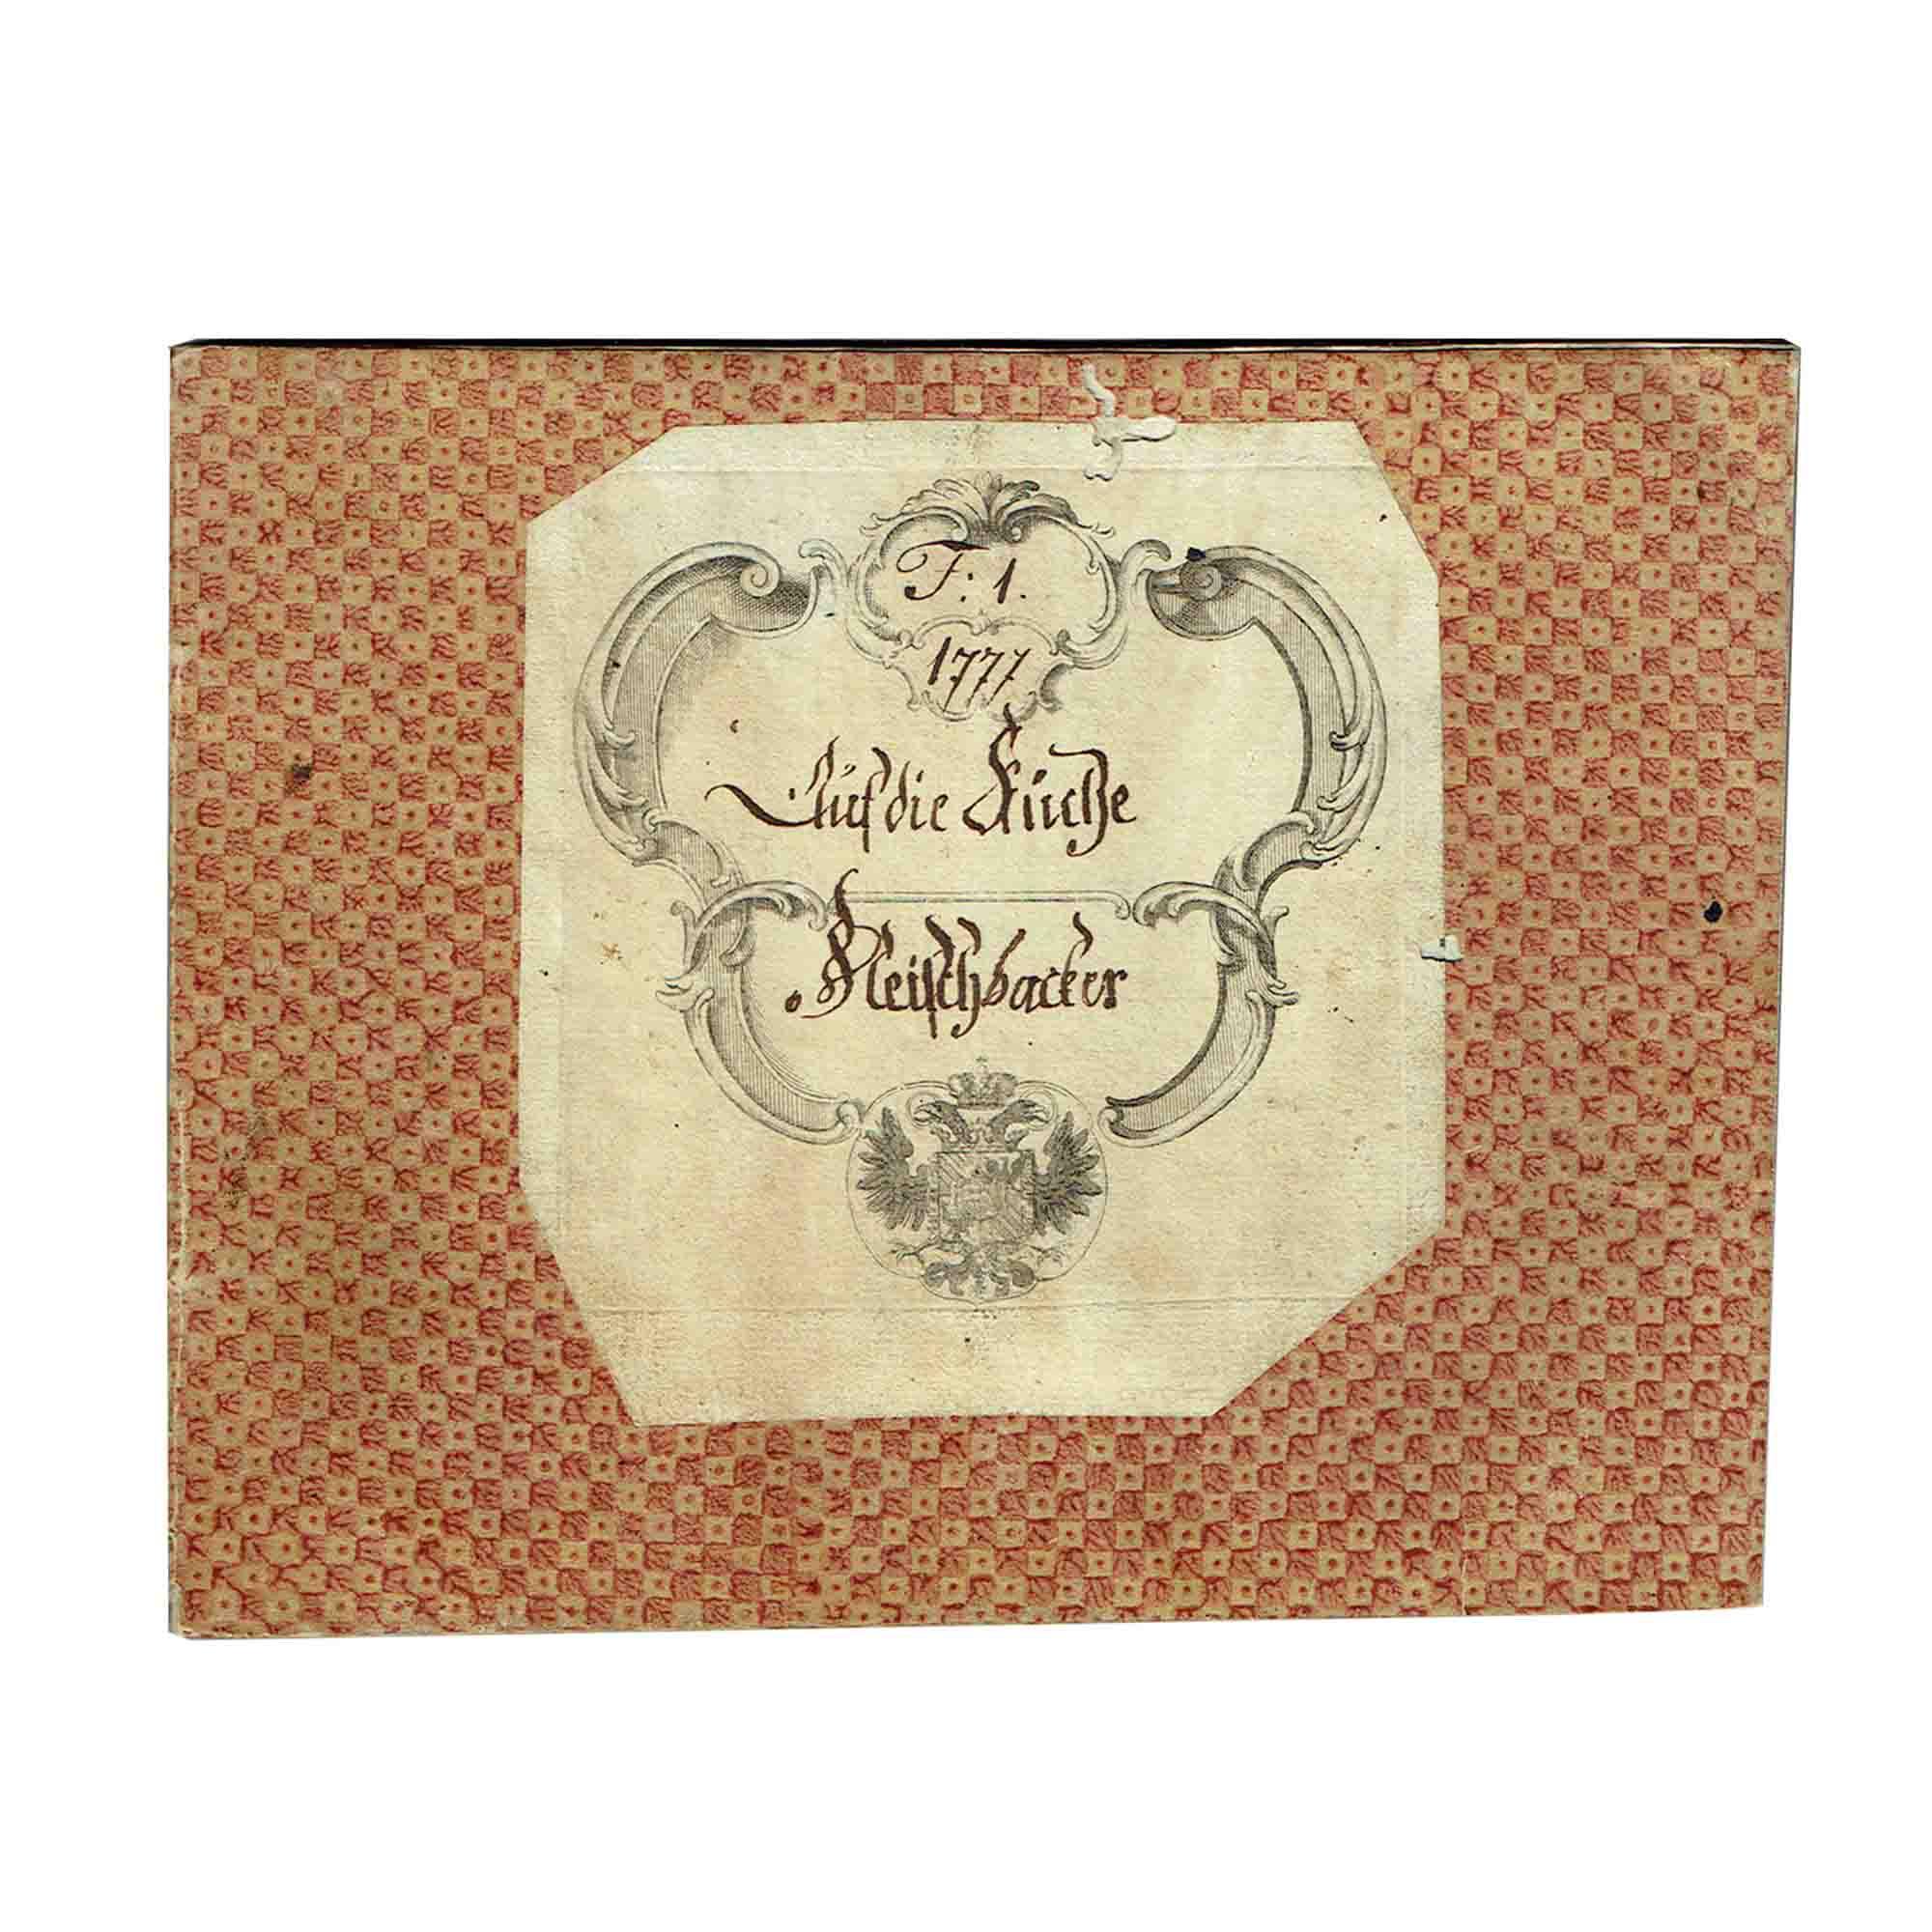 5359-Wareneingangsbuch-Fleischhauer-Hofküche-Wien-1777-frei-N.jpeg